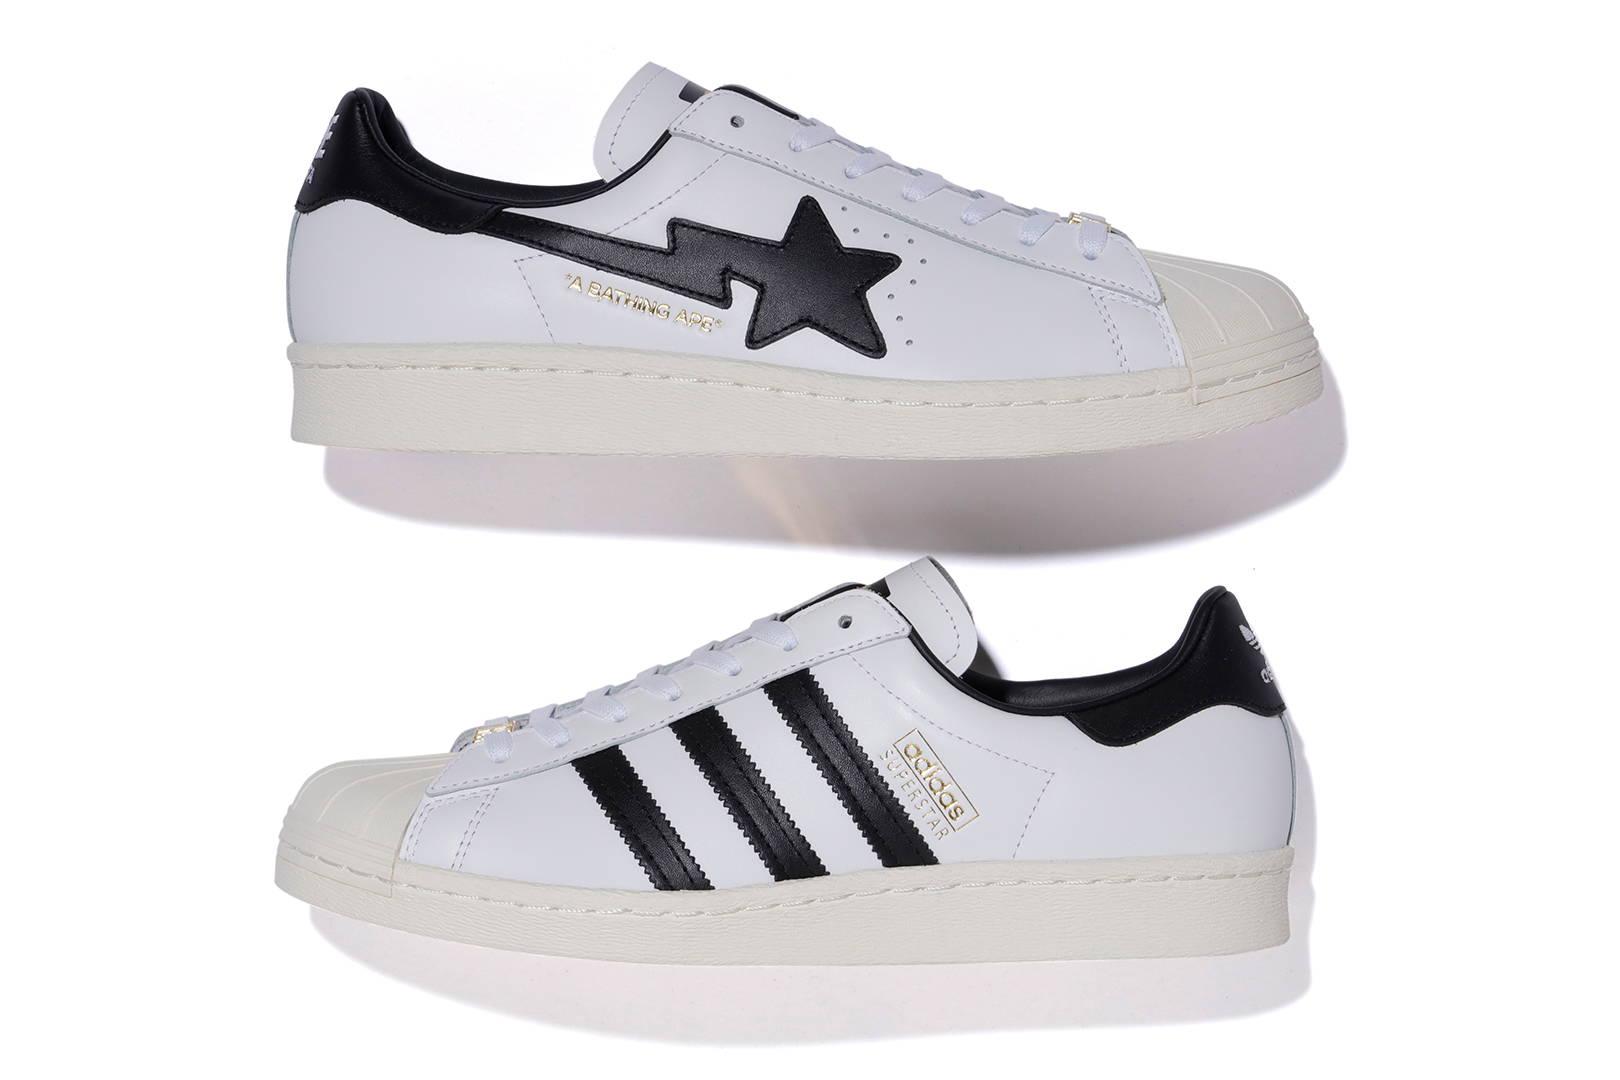 Bape x Adidas Originals Superstar Lateral